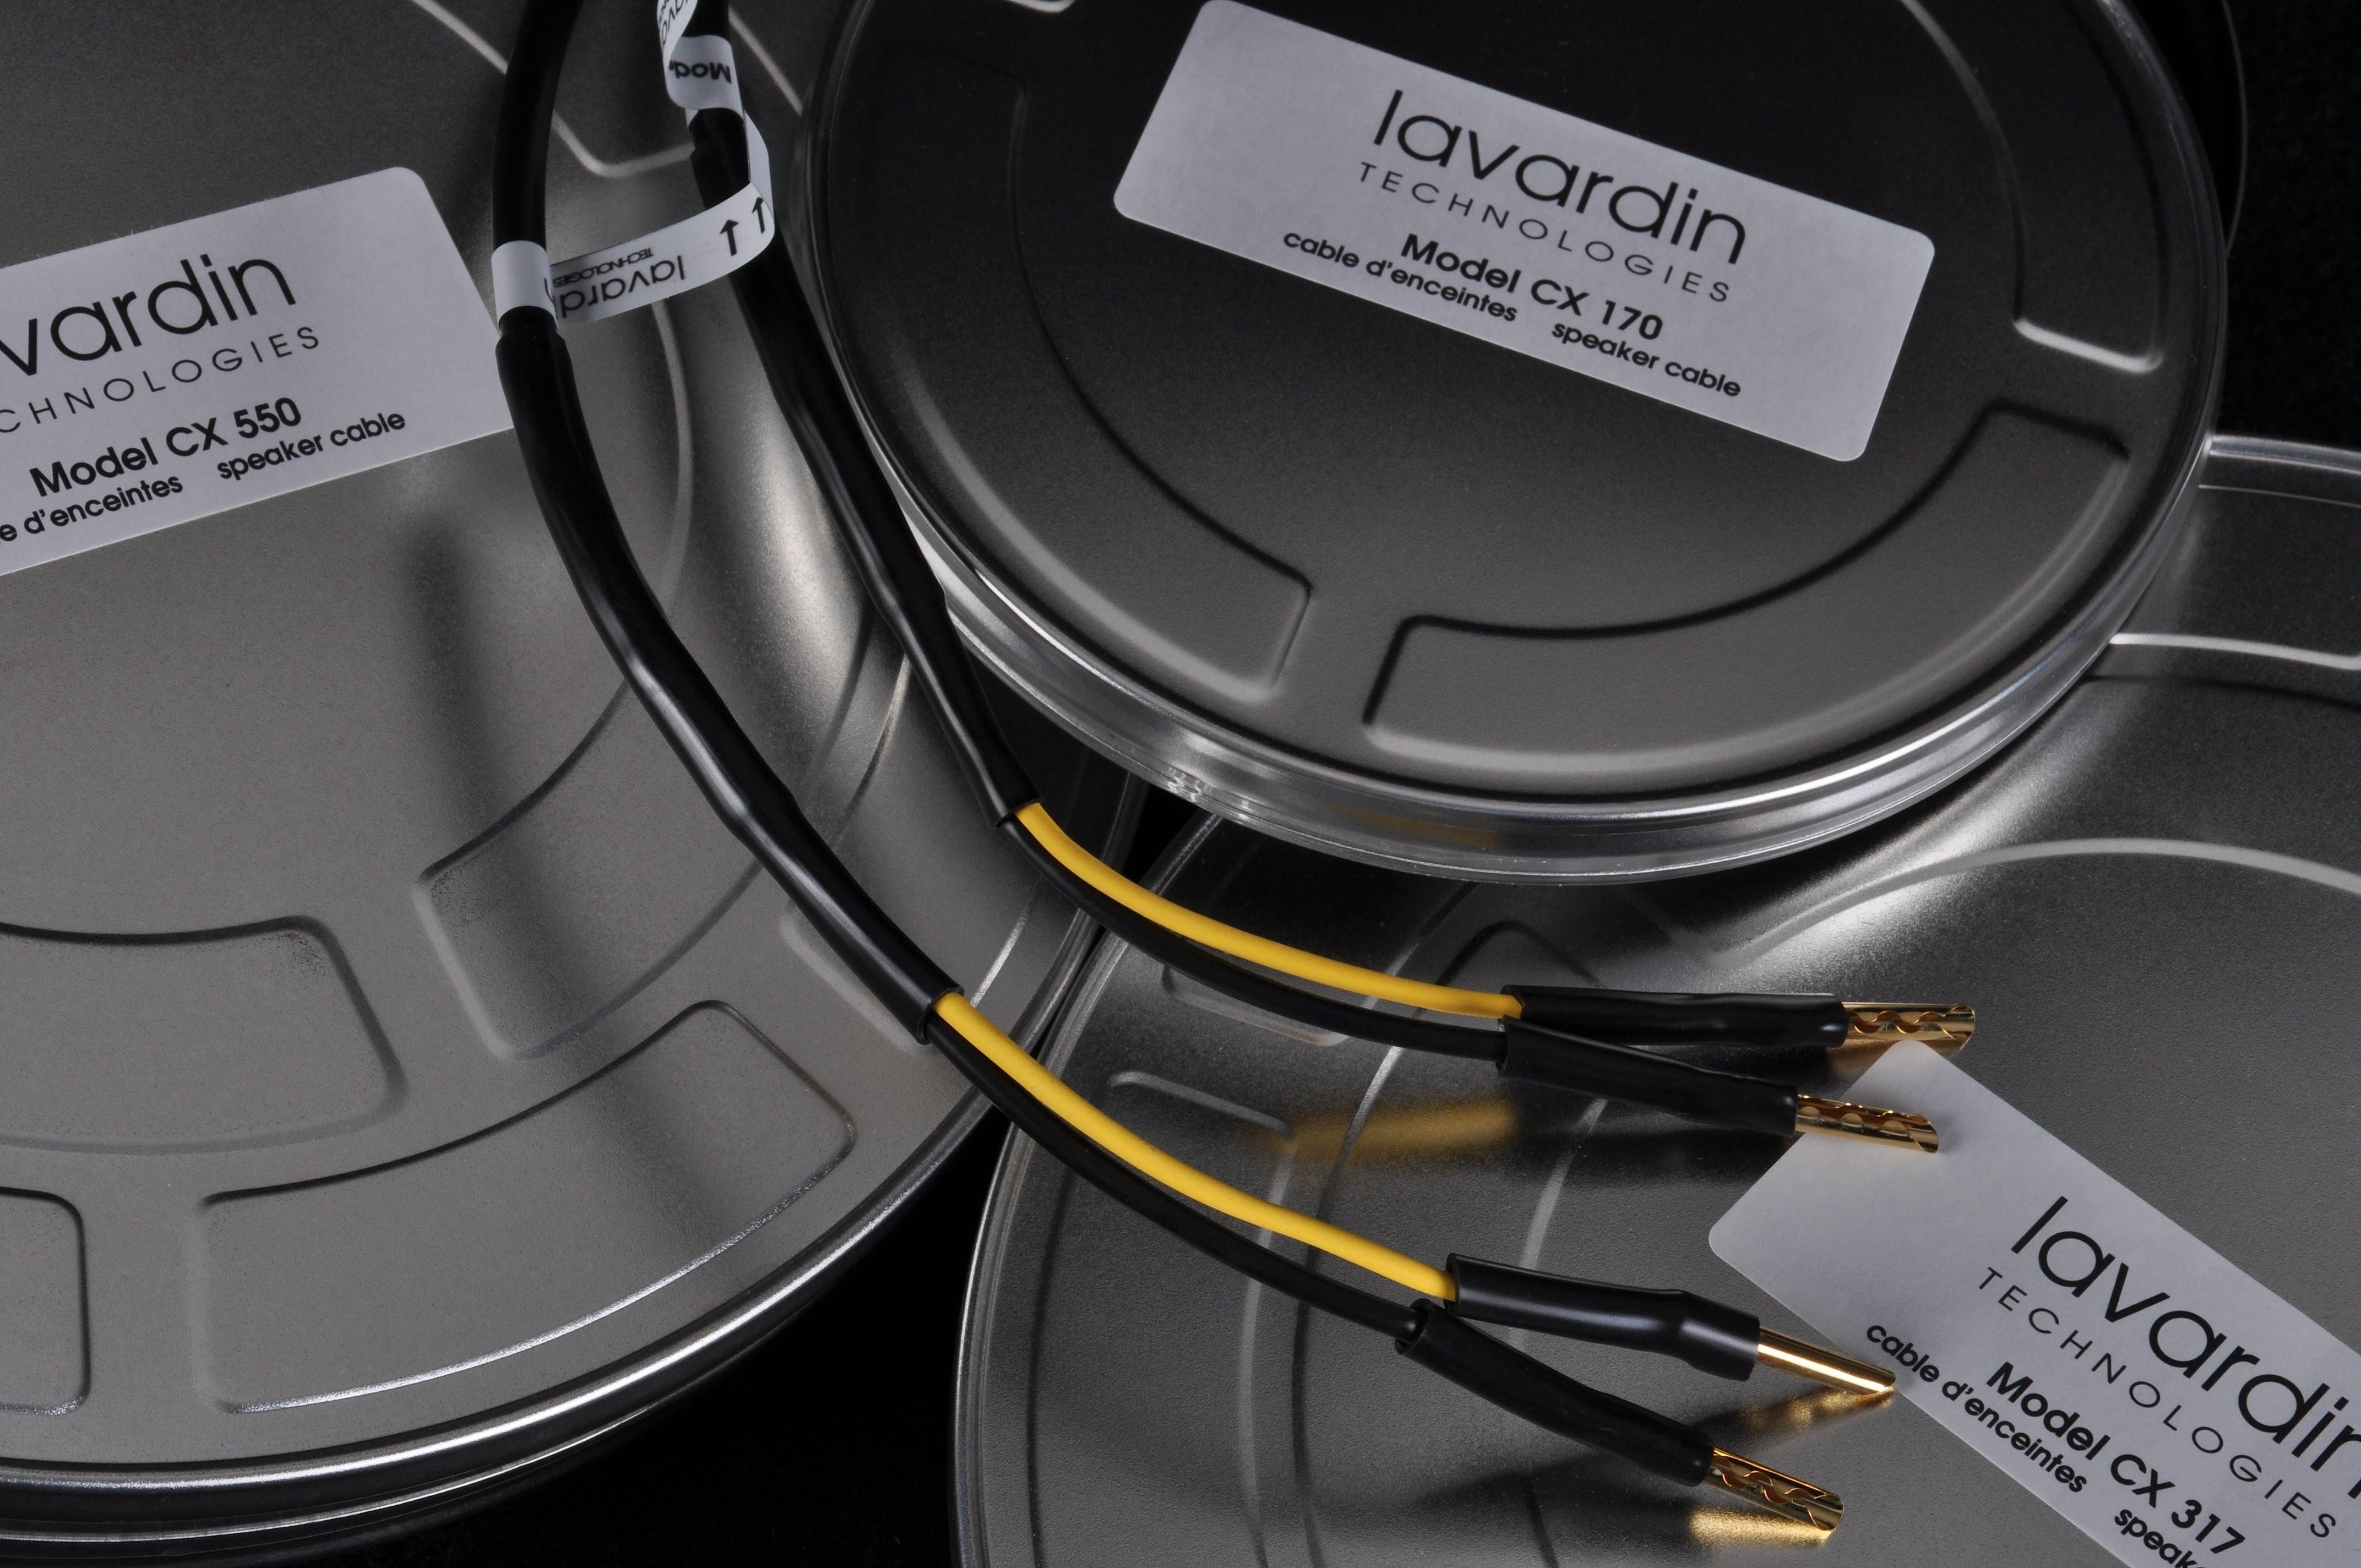 Câbles Enceintes Lavardin CX 170